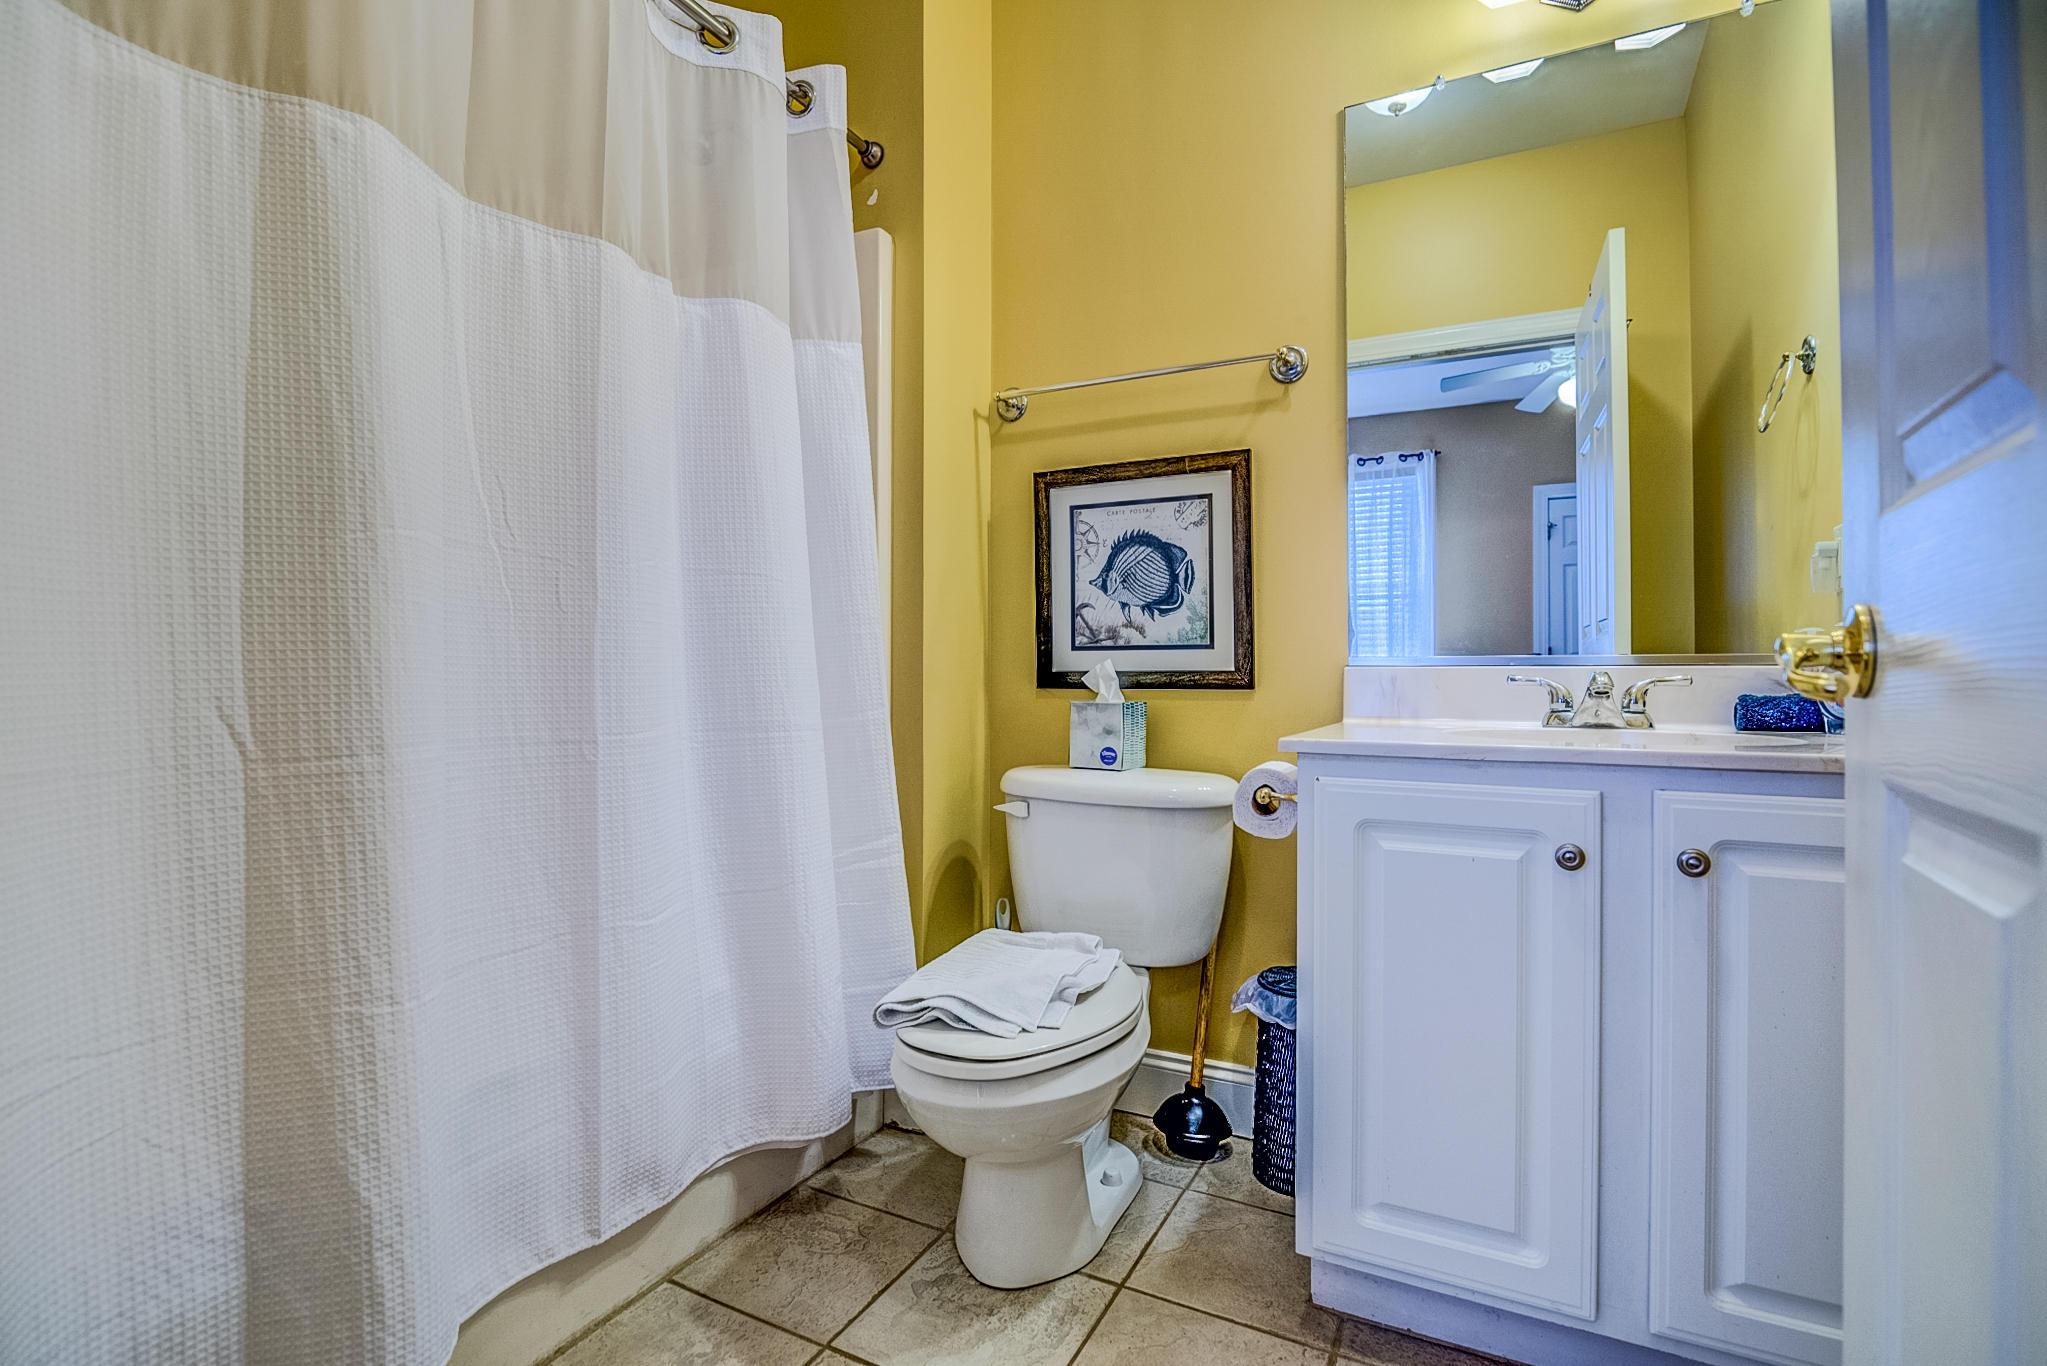 Ocean Pointe Villas Homes For Sale - 214 Arctic, Folly Beach, SC - 4